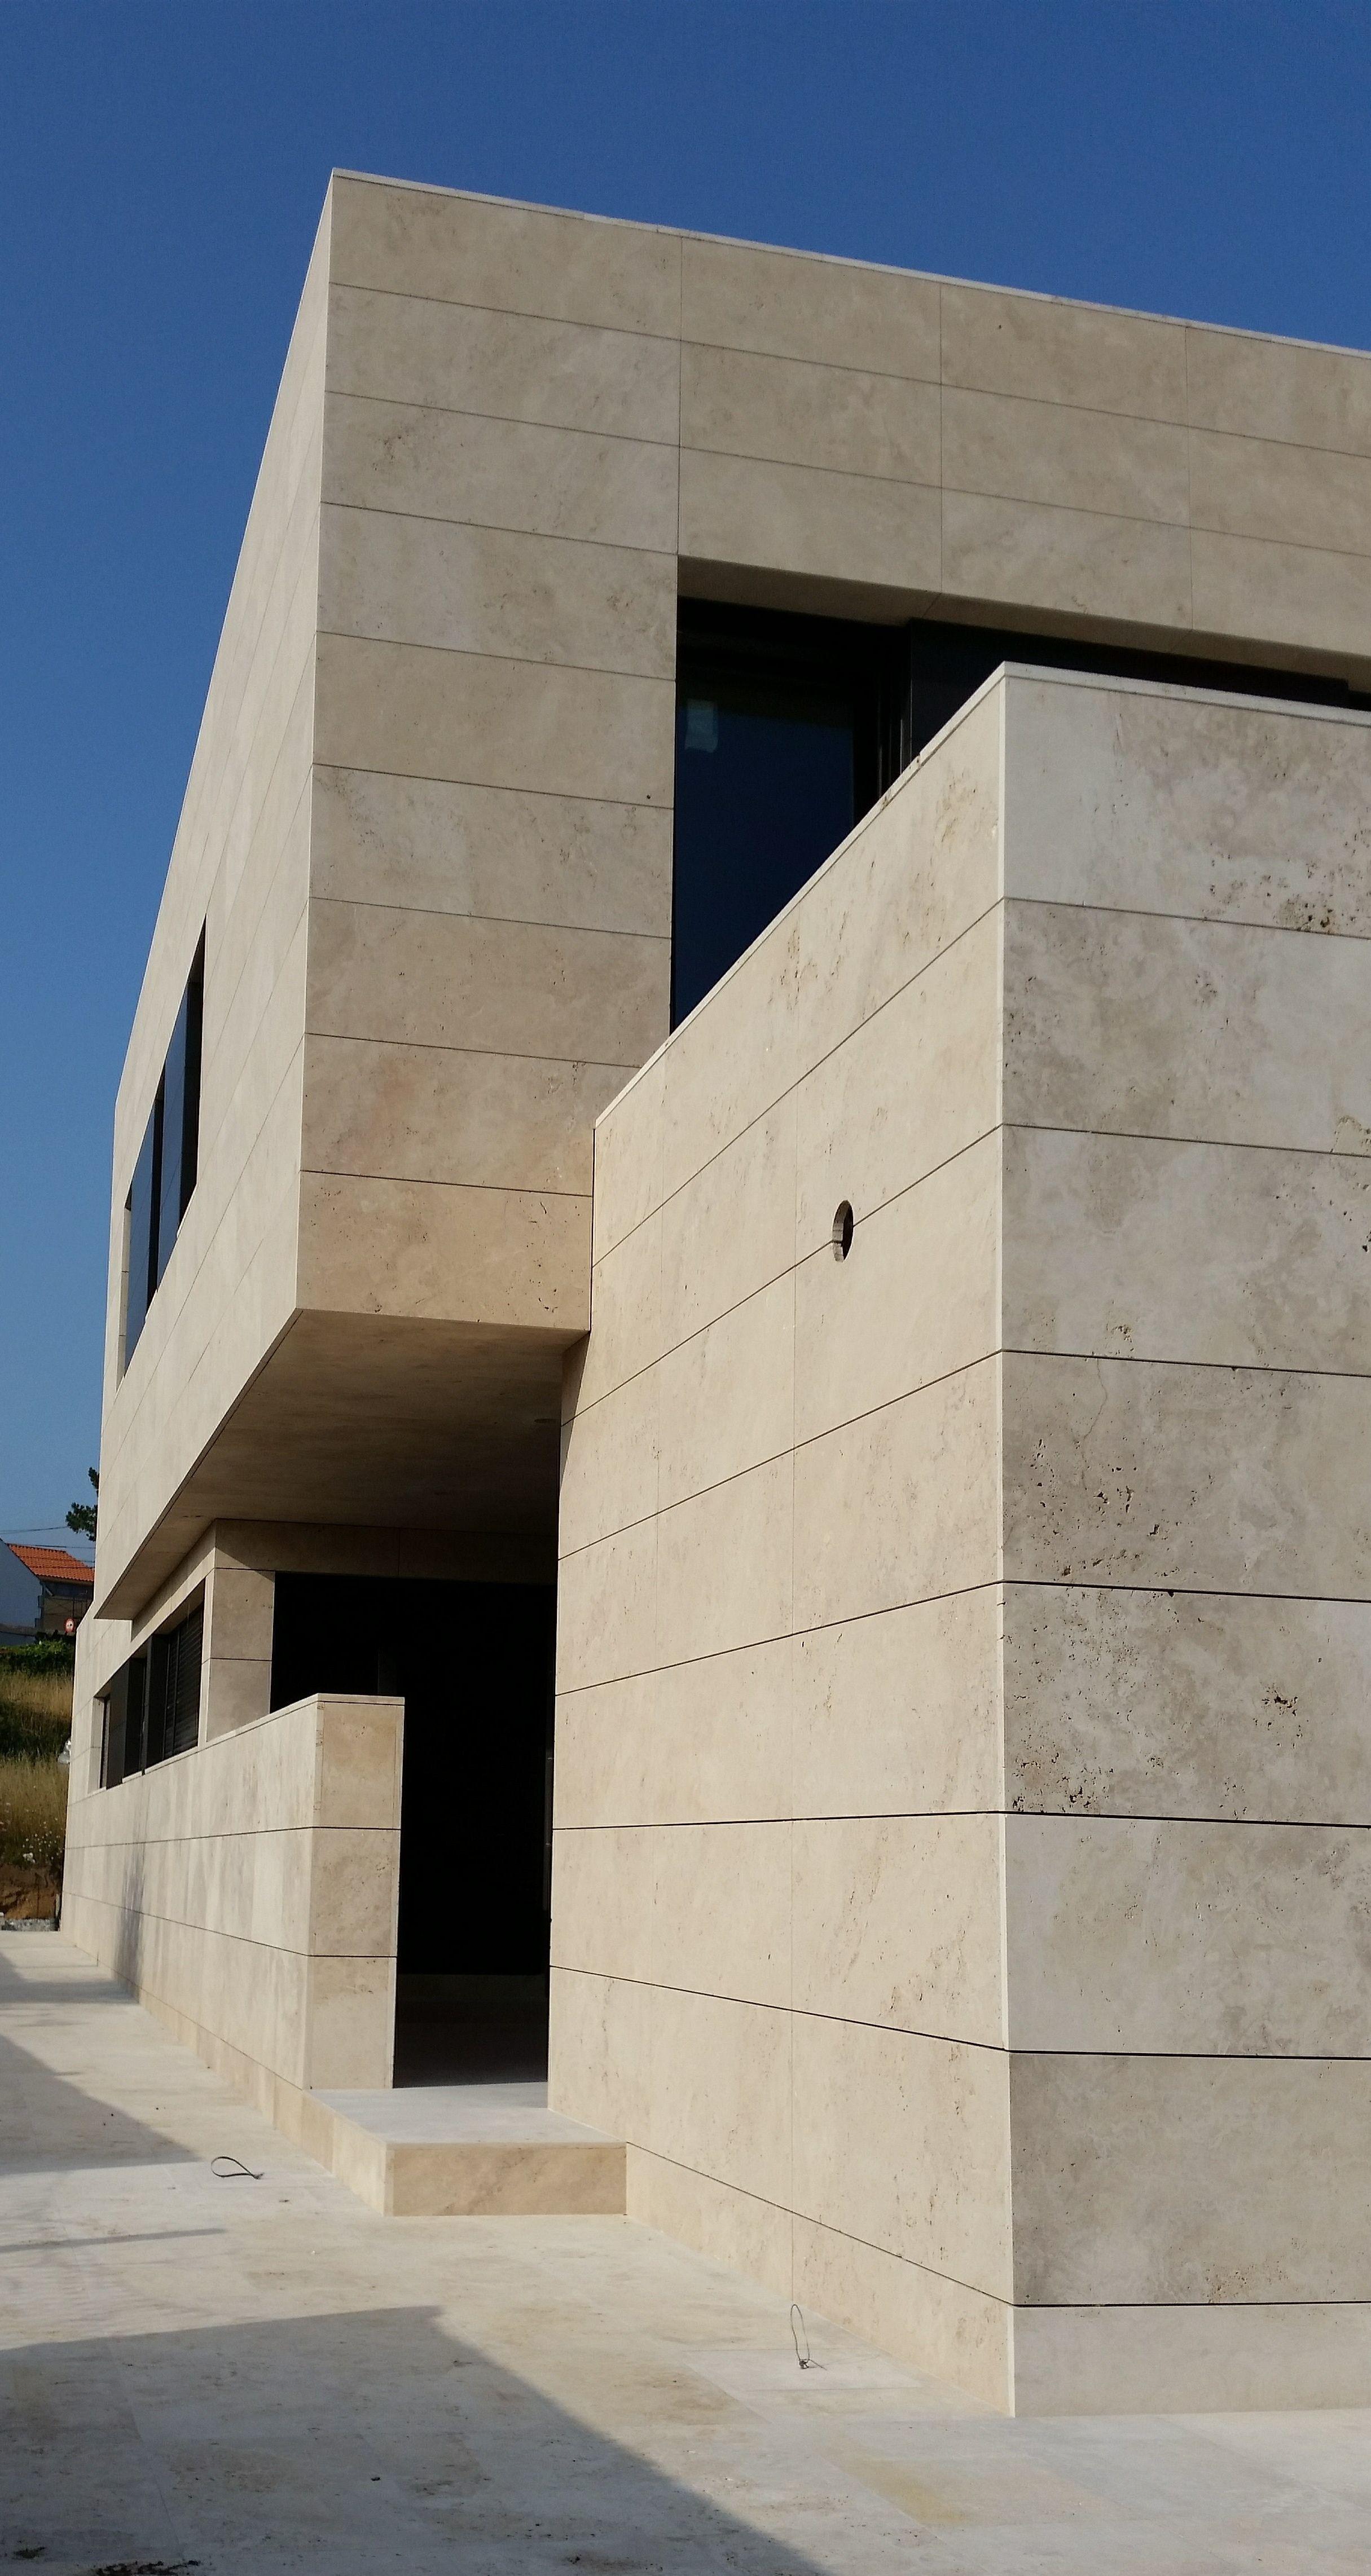 Marmol travertino para fachadas tambin hay travertino en - Piedra caliza para fachadas ...